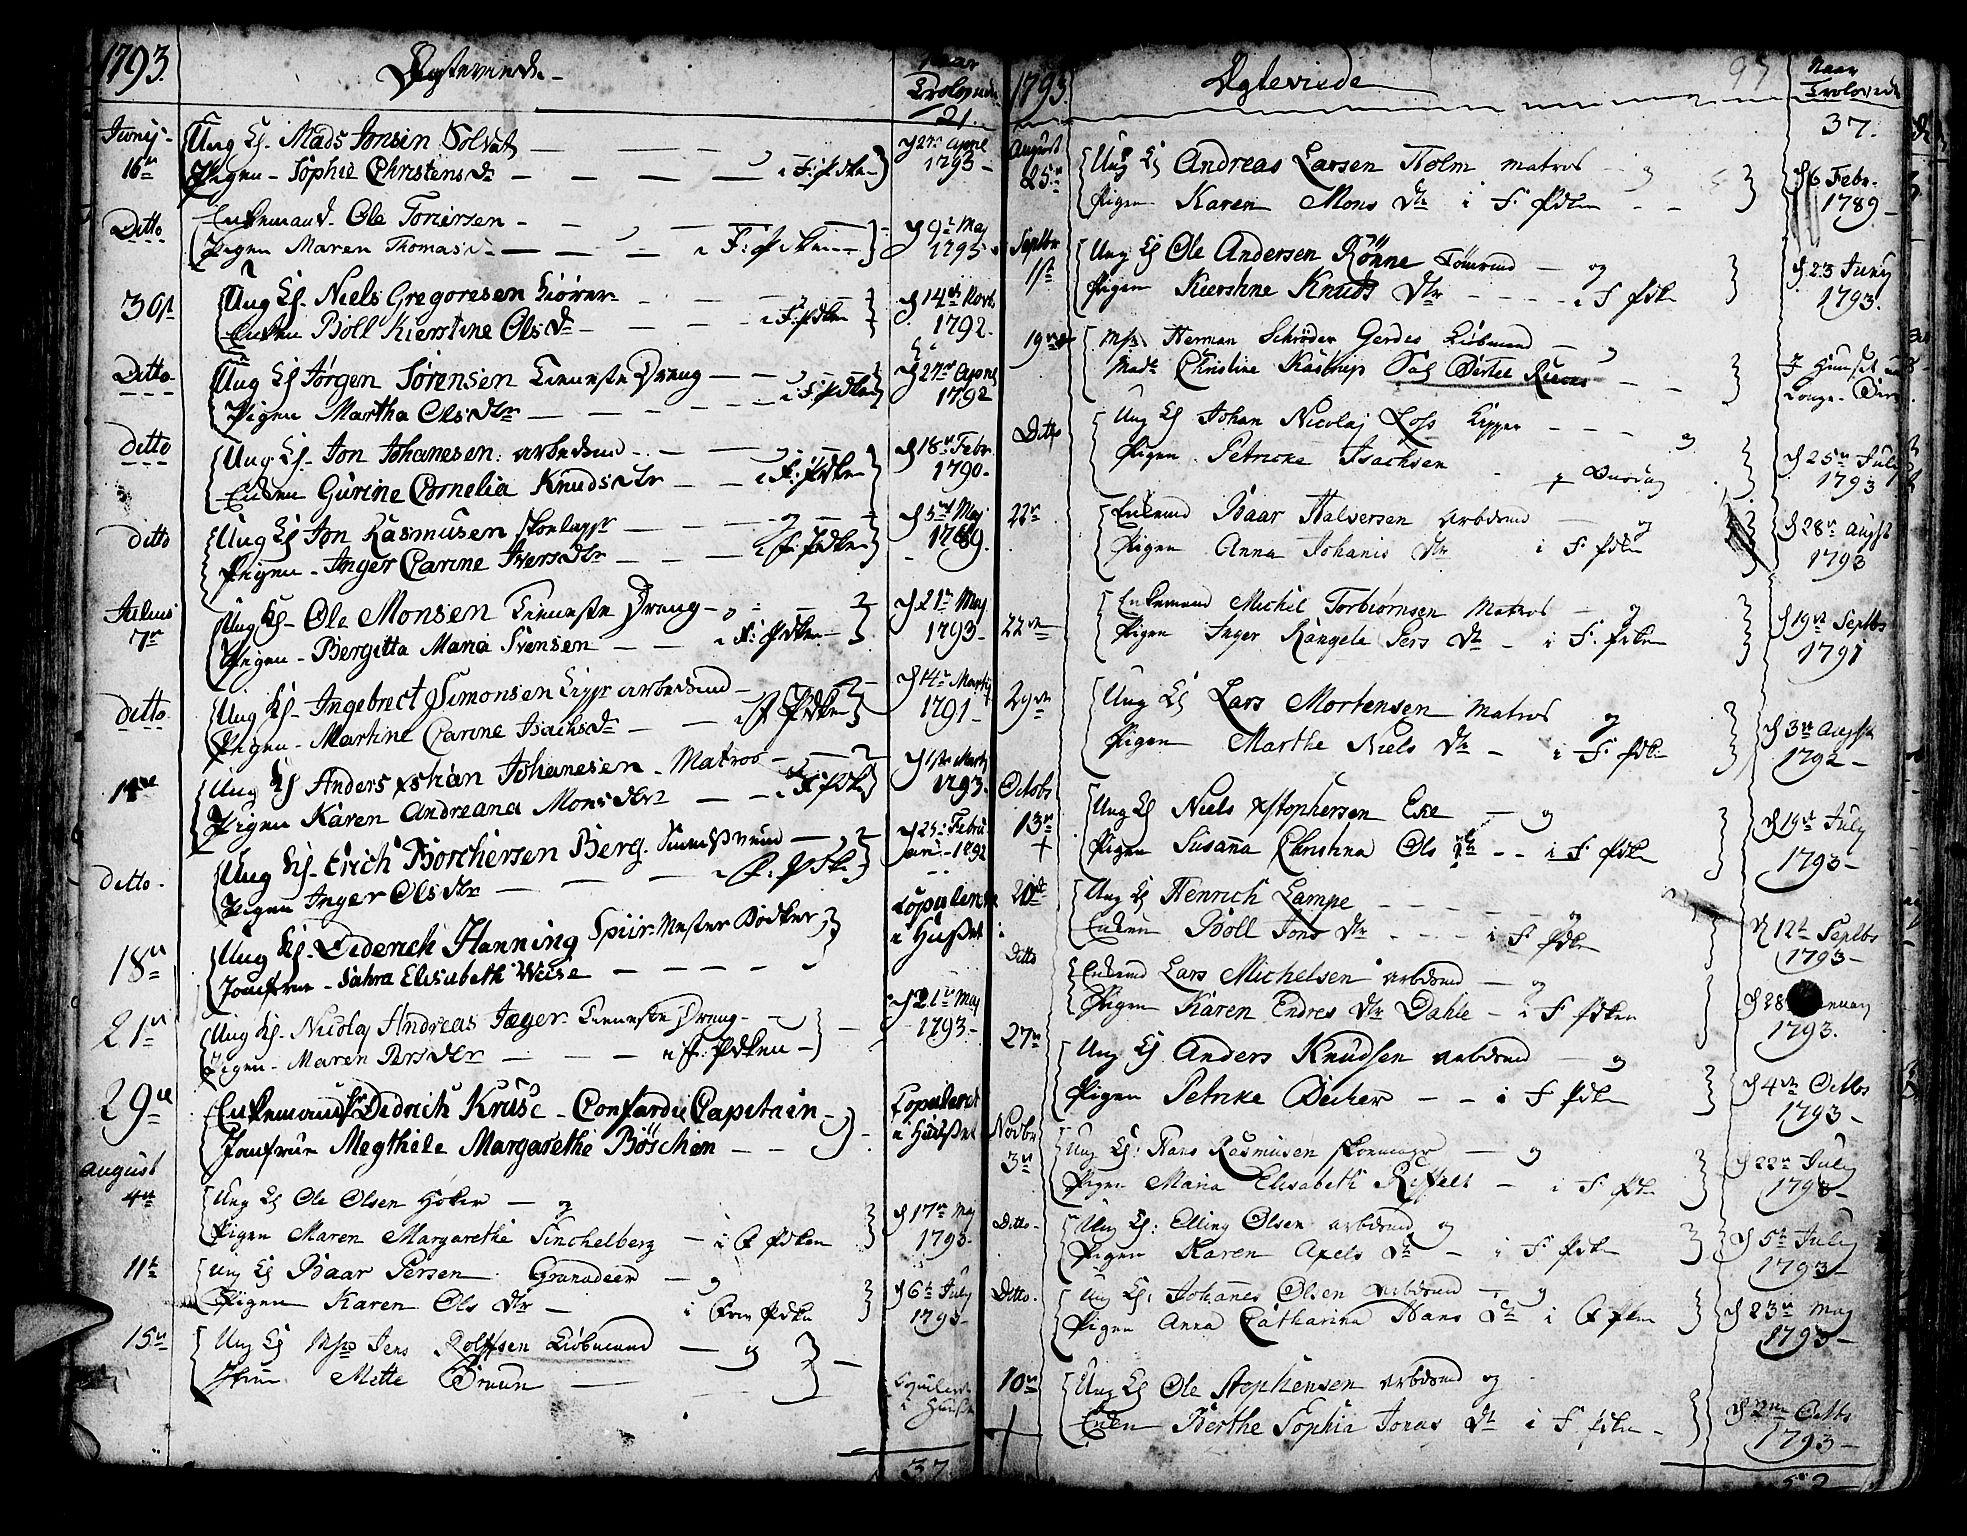 SAB, Korskirken Sokneprestembete, H/Haa/L0009: Parish register (official) no. A 9, 1743-1861, p. 97